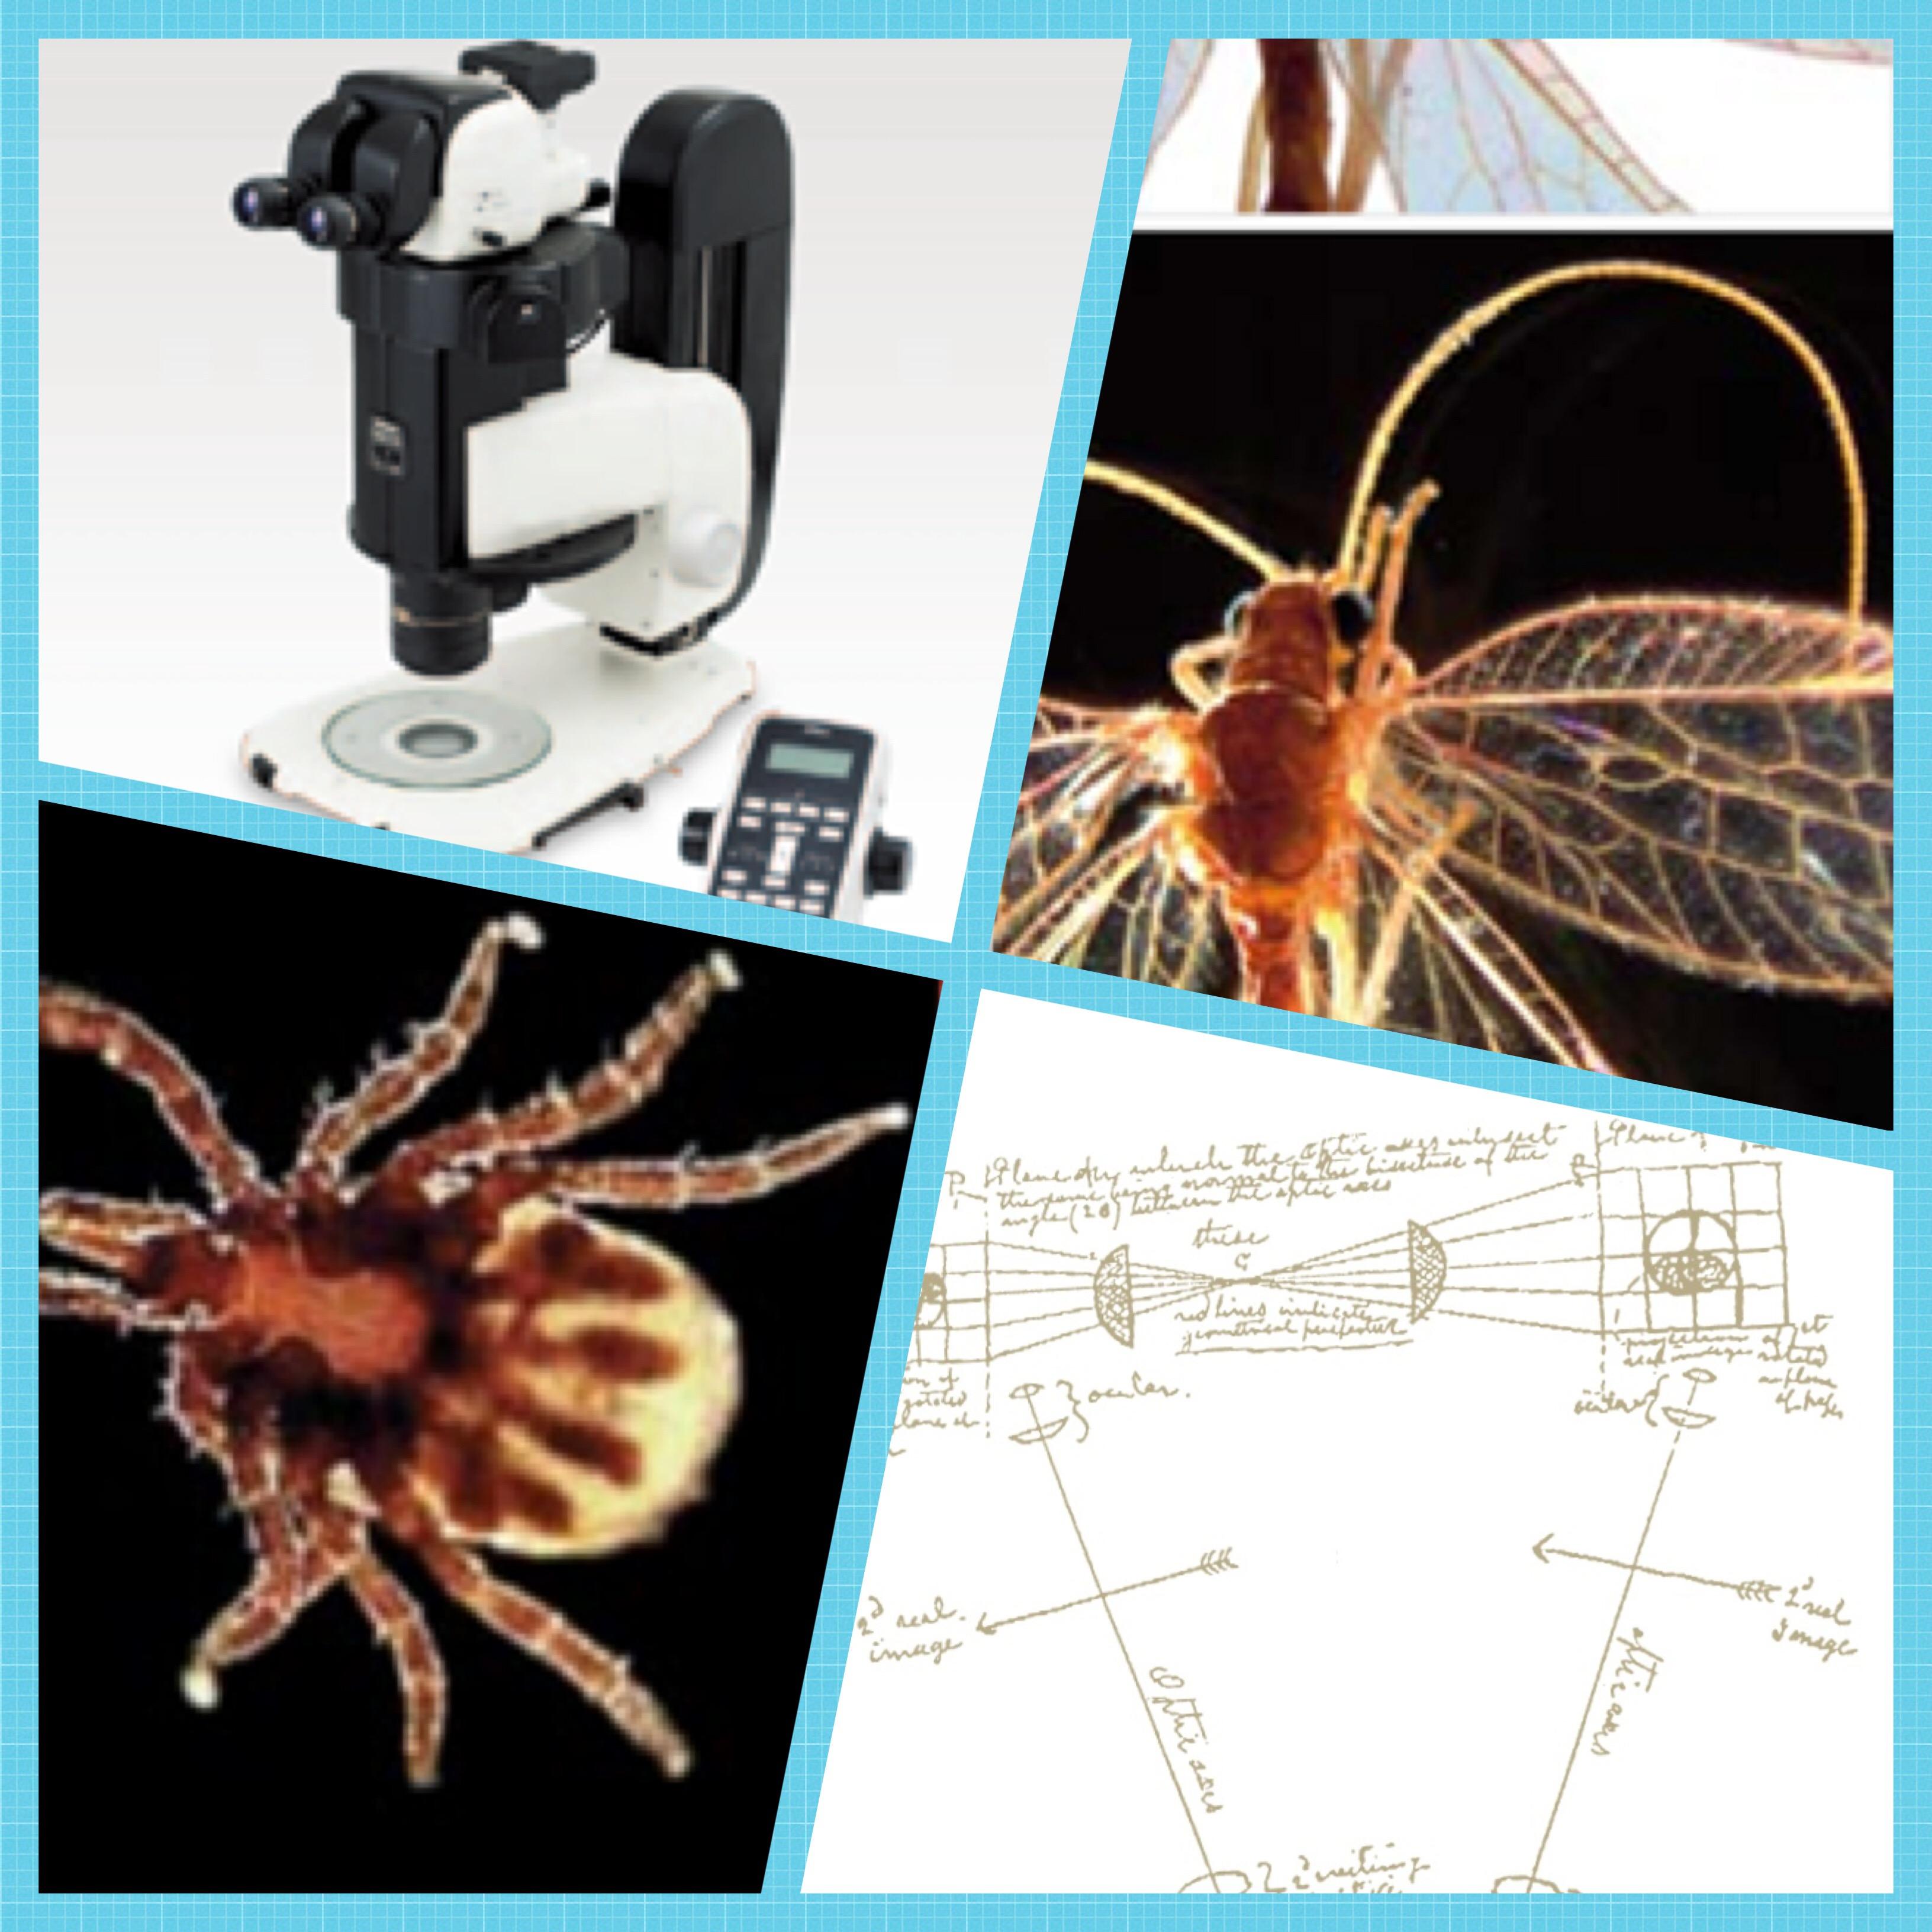 体视显微镜系列